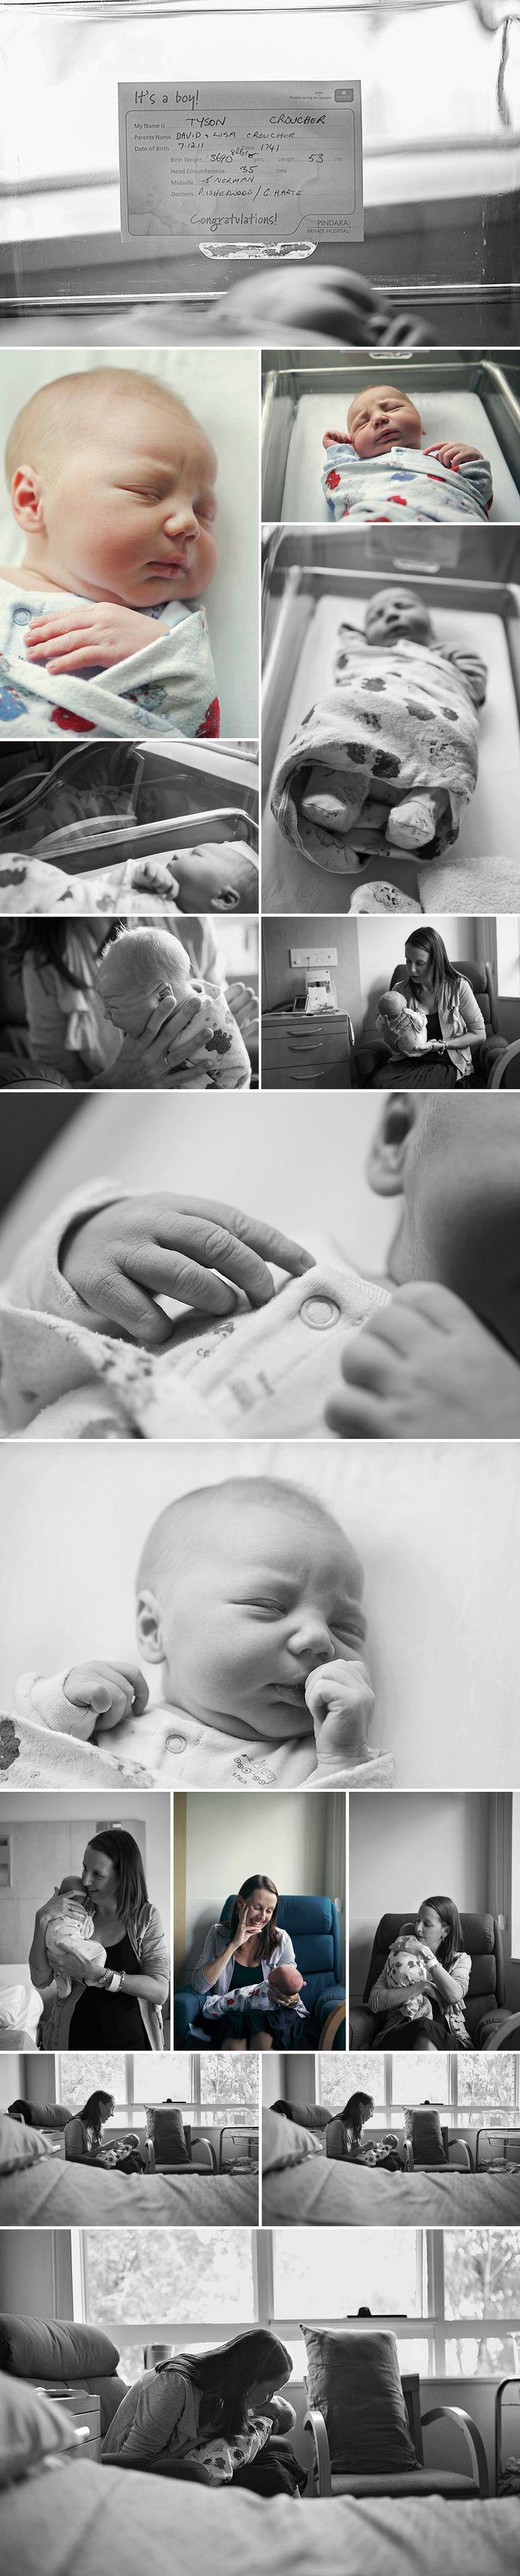 Hospital photo ideas